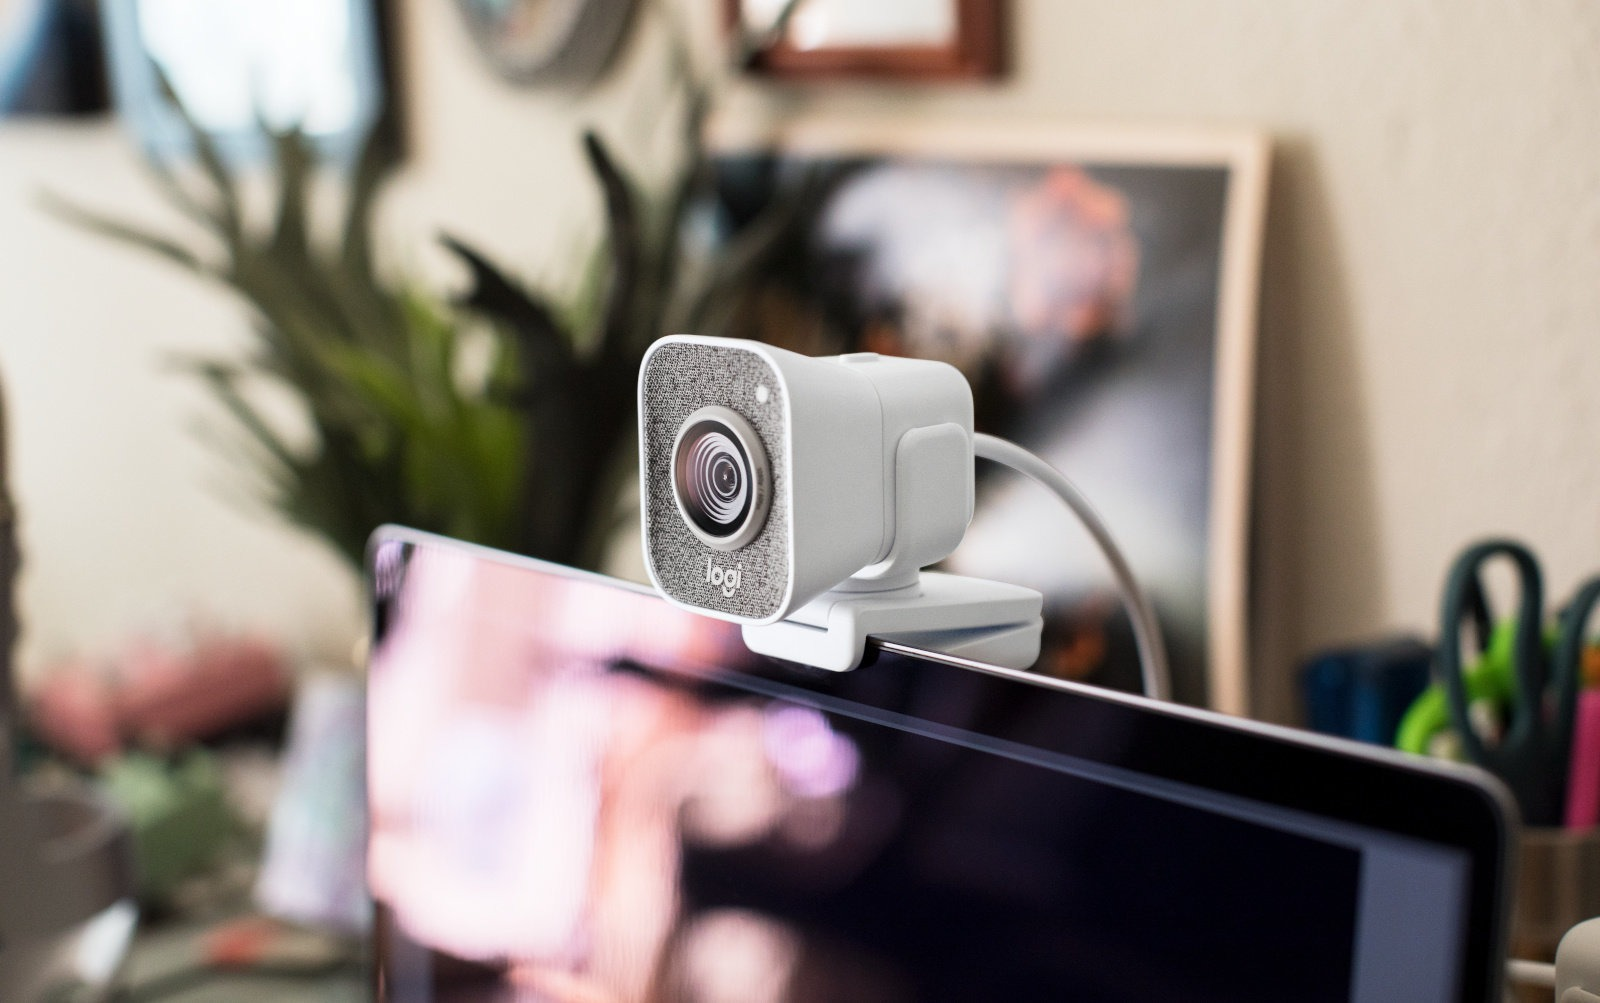 Logitech tung ra StreamCam, chiếc webcam hướng đến streamer, giá 170 USD